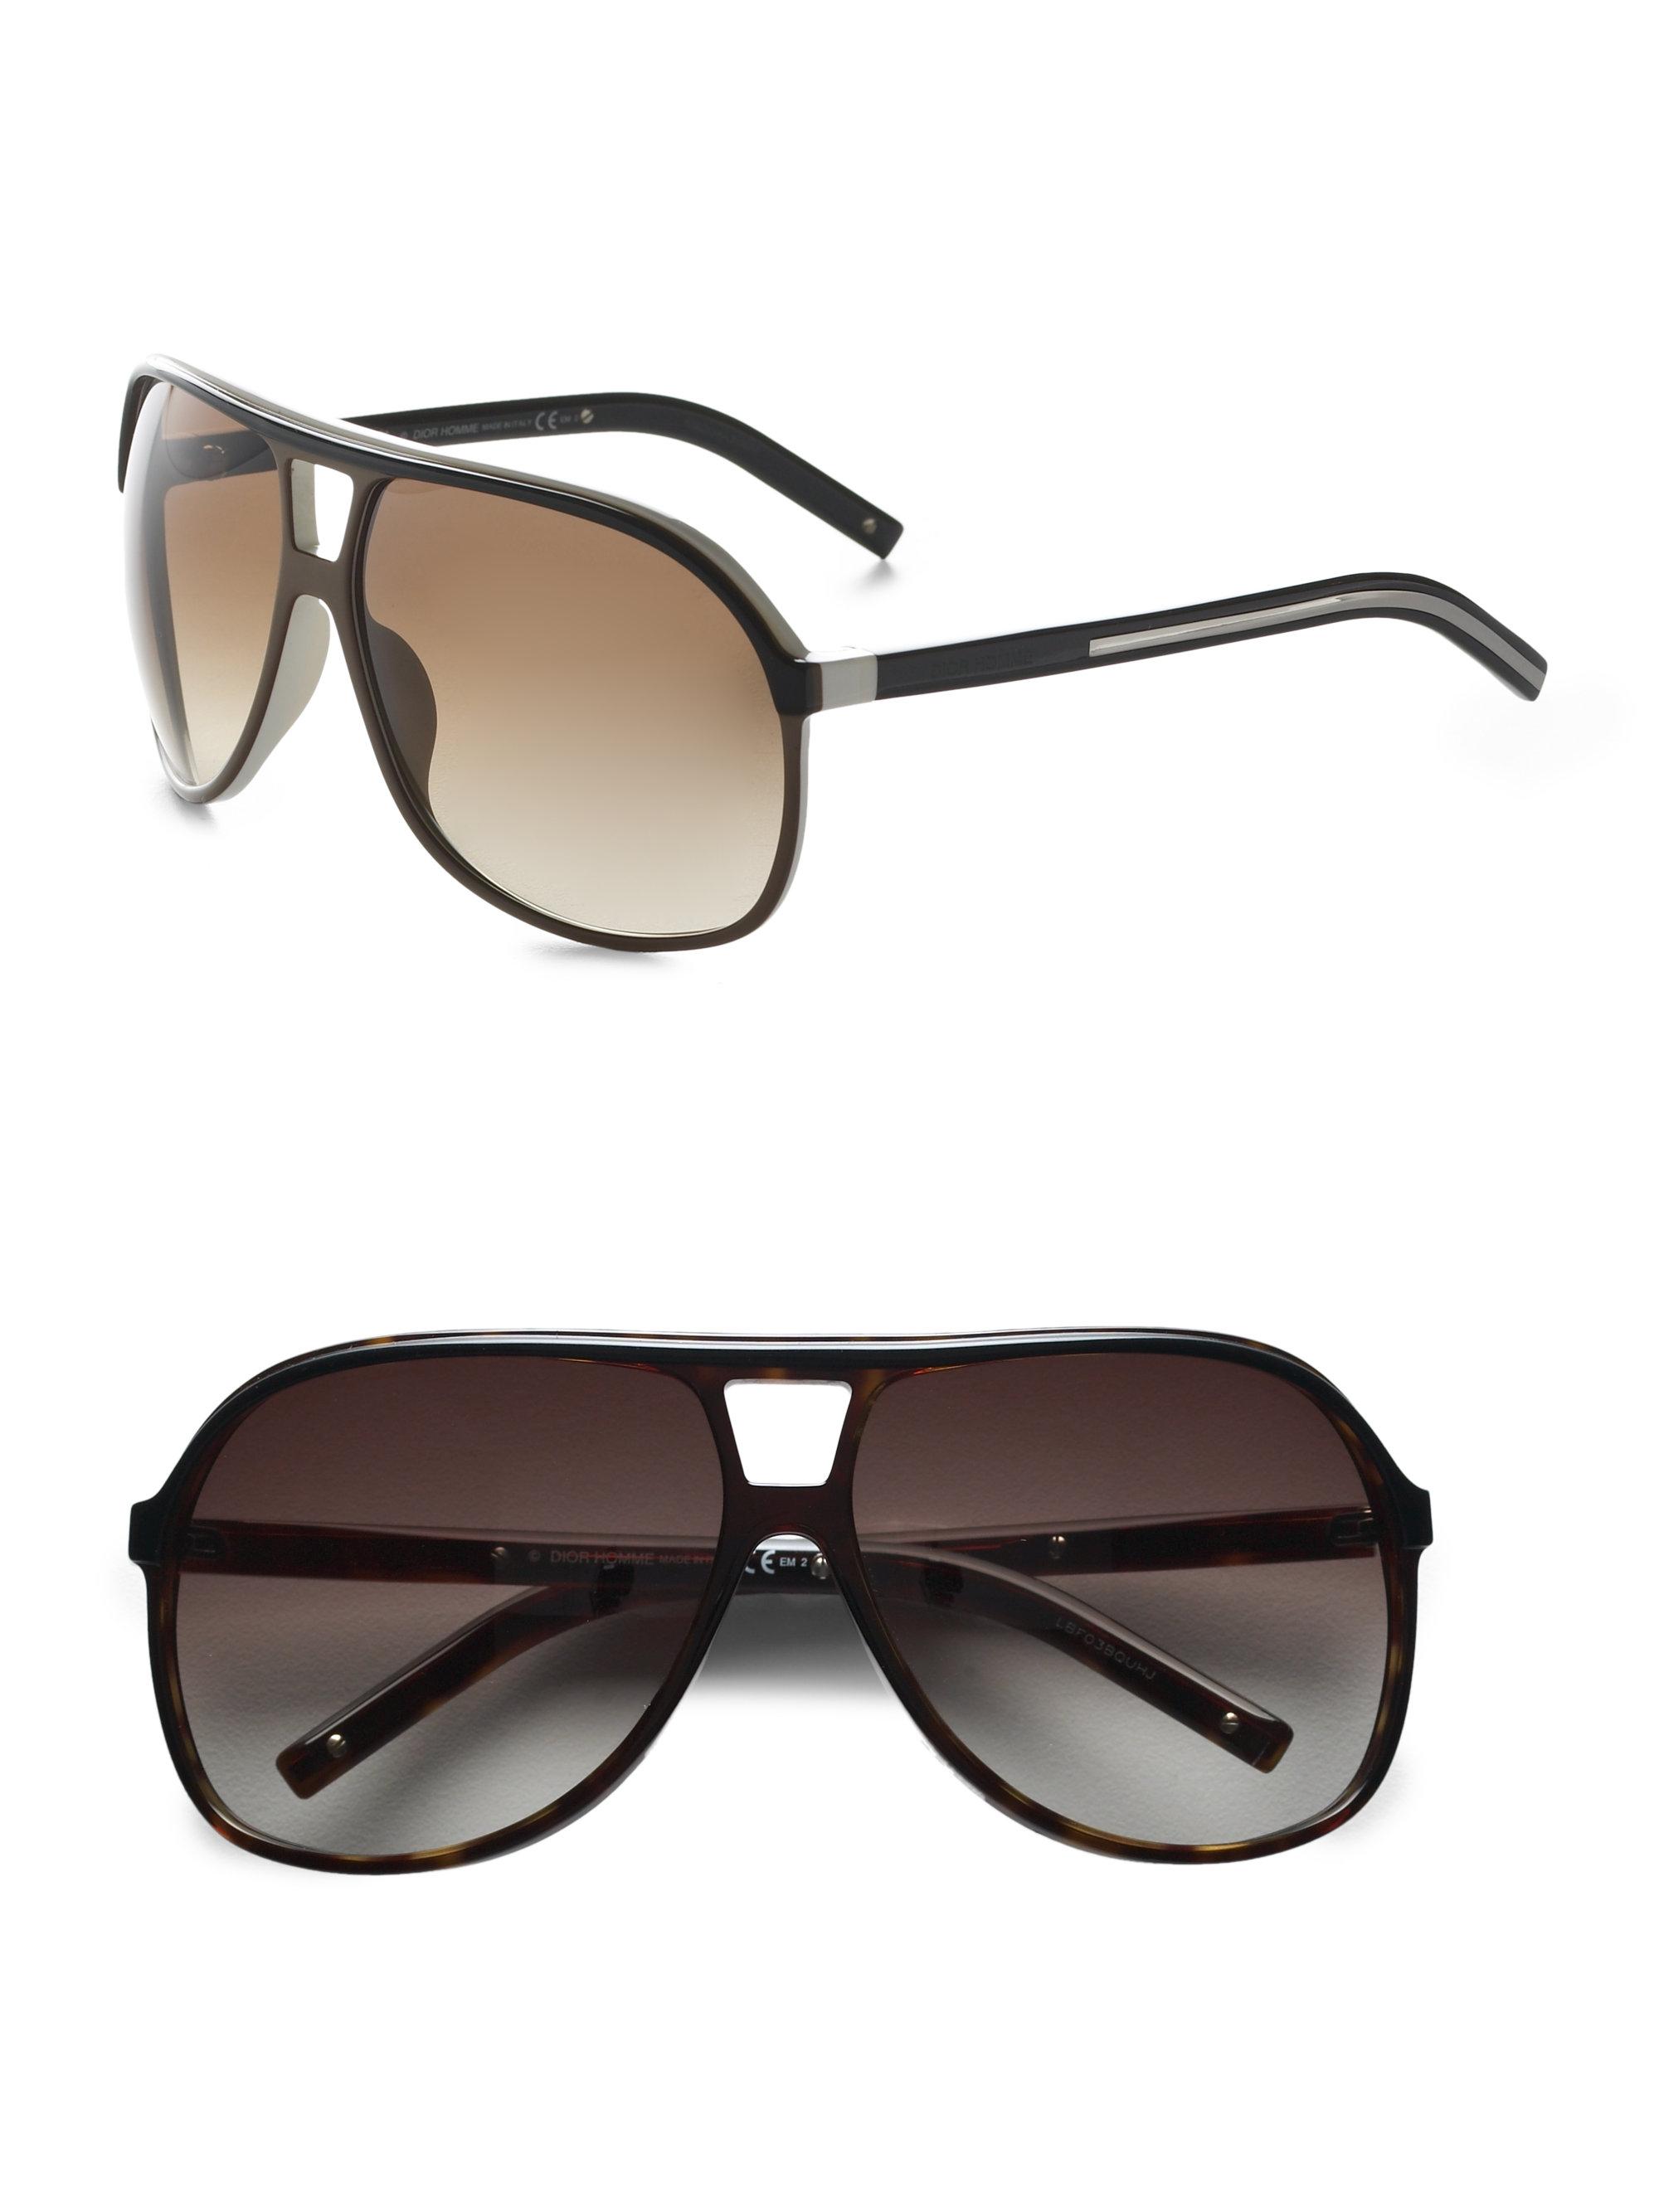 ralph lauren auto aviator shield sunglasses louisiana. Black Bedroom Furniture Sets. Home Design Ideas